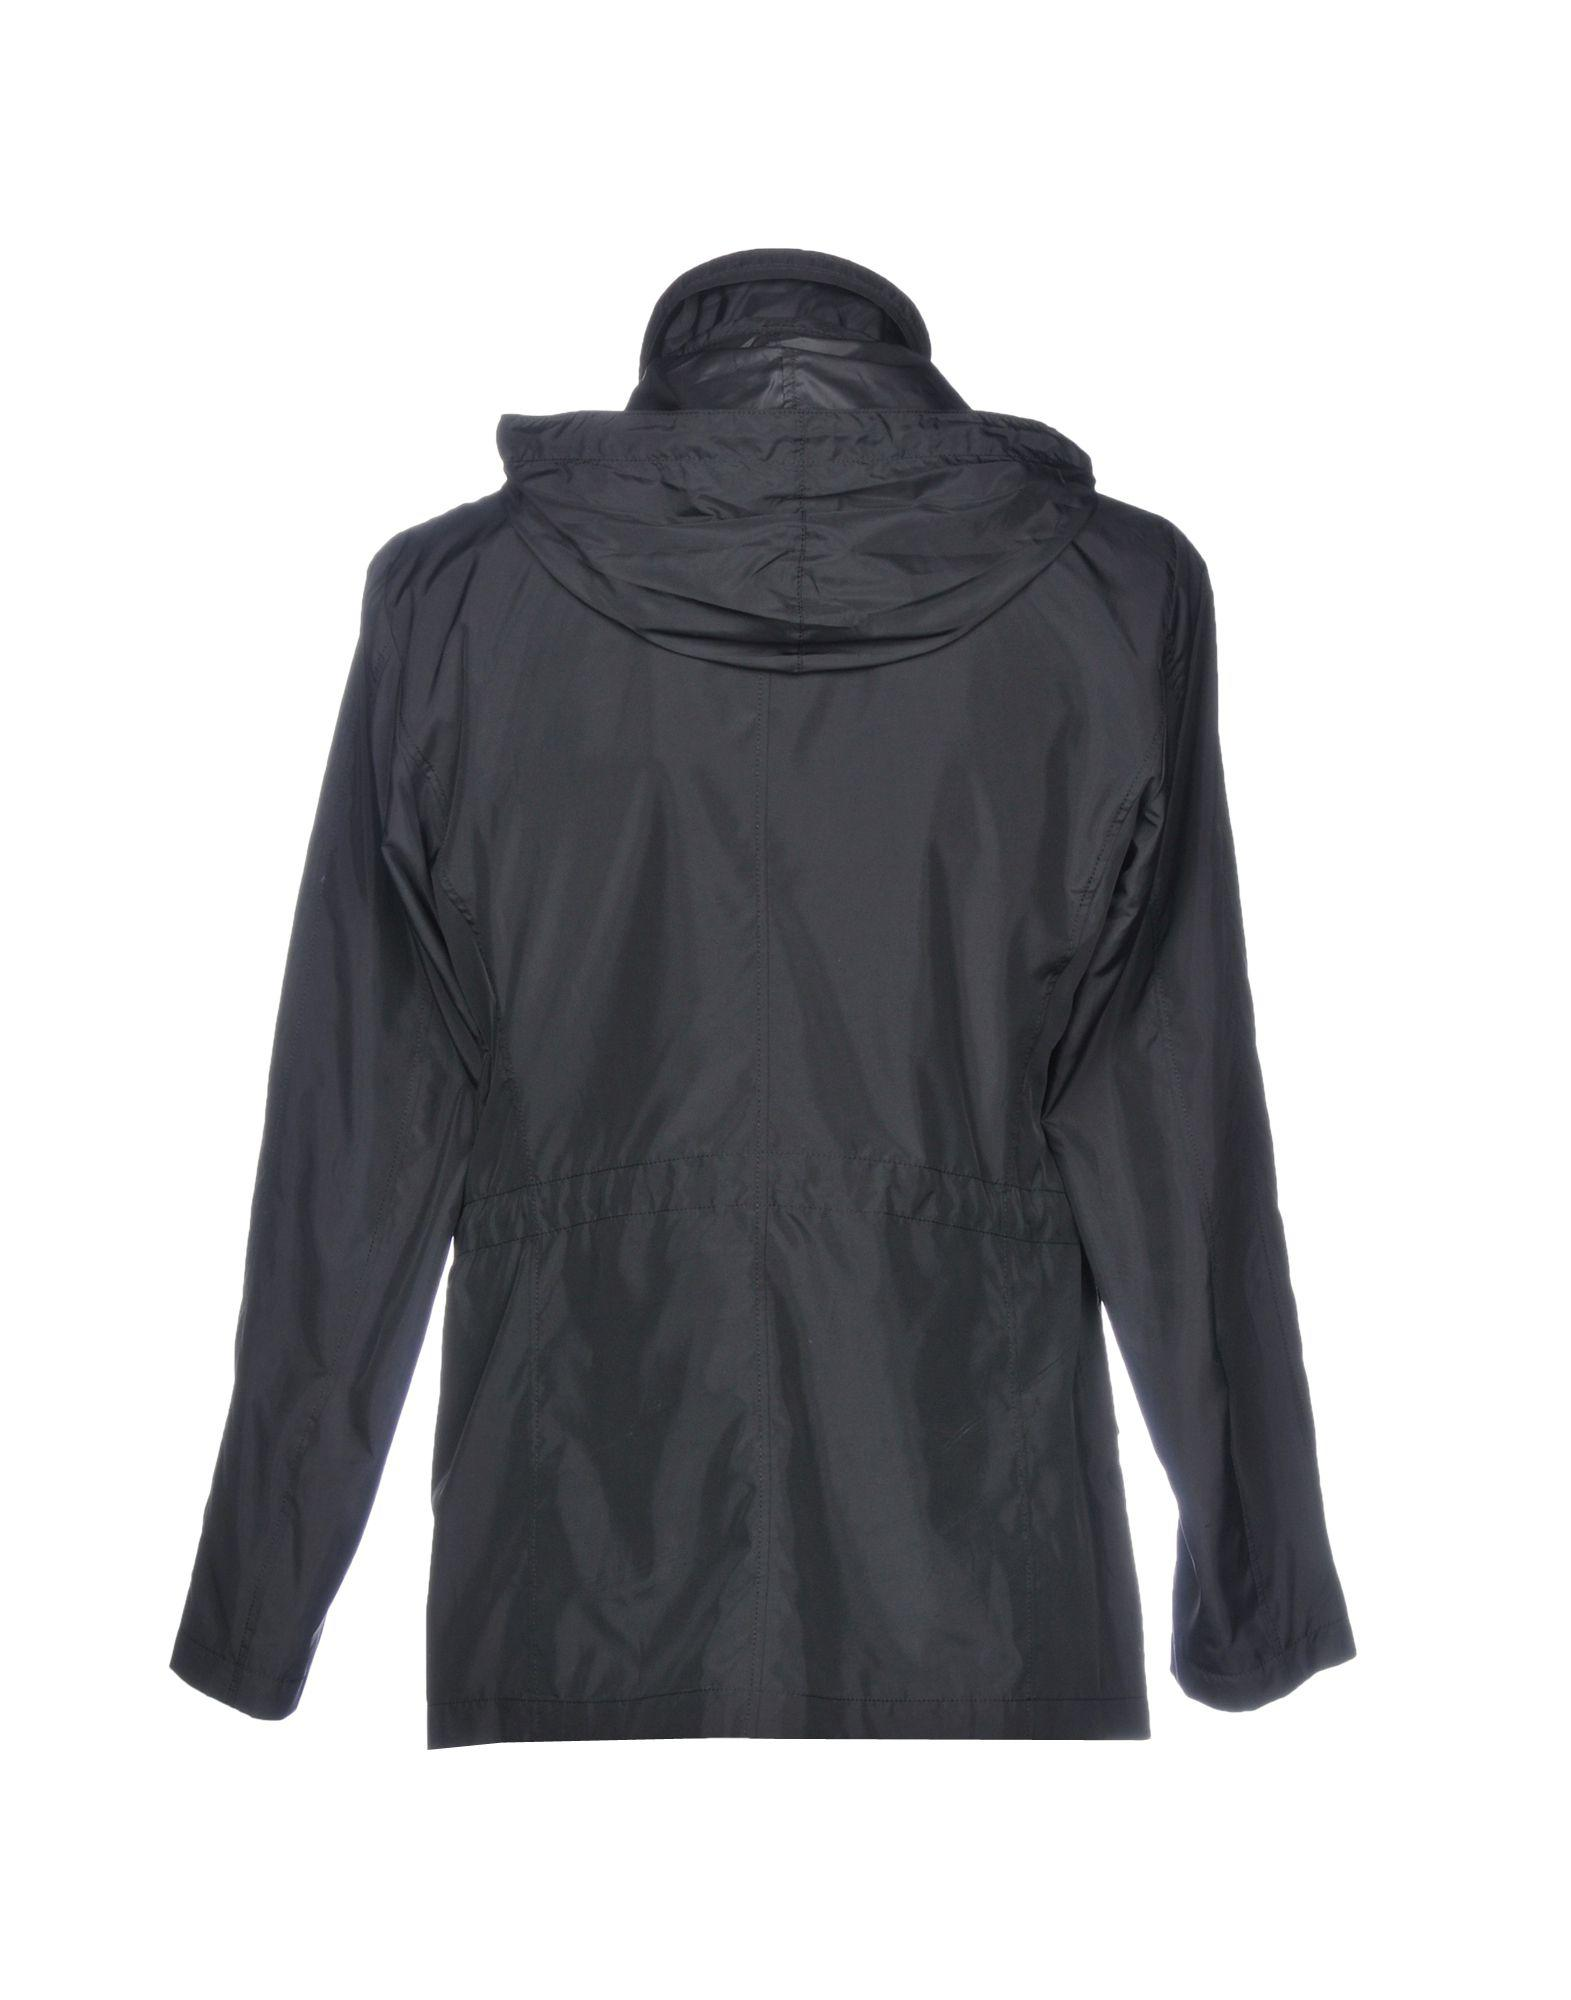 Allegri Synthetic Jackets in Steel Grey (Grey) for Men